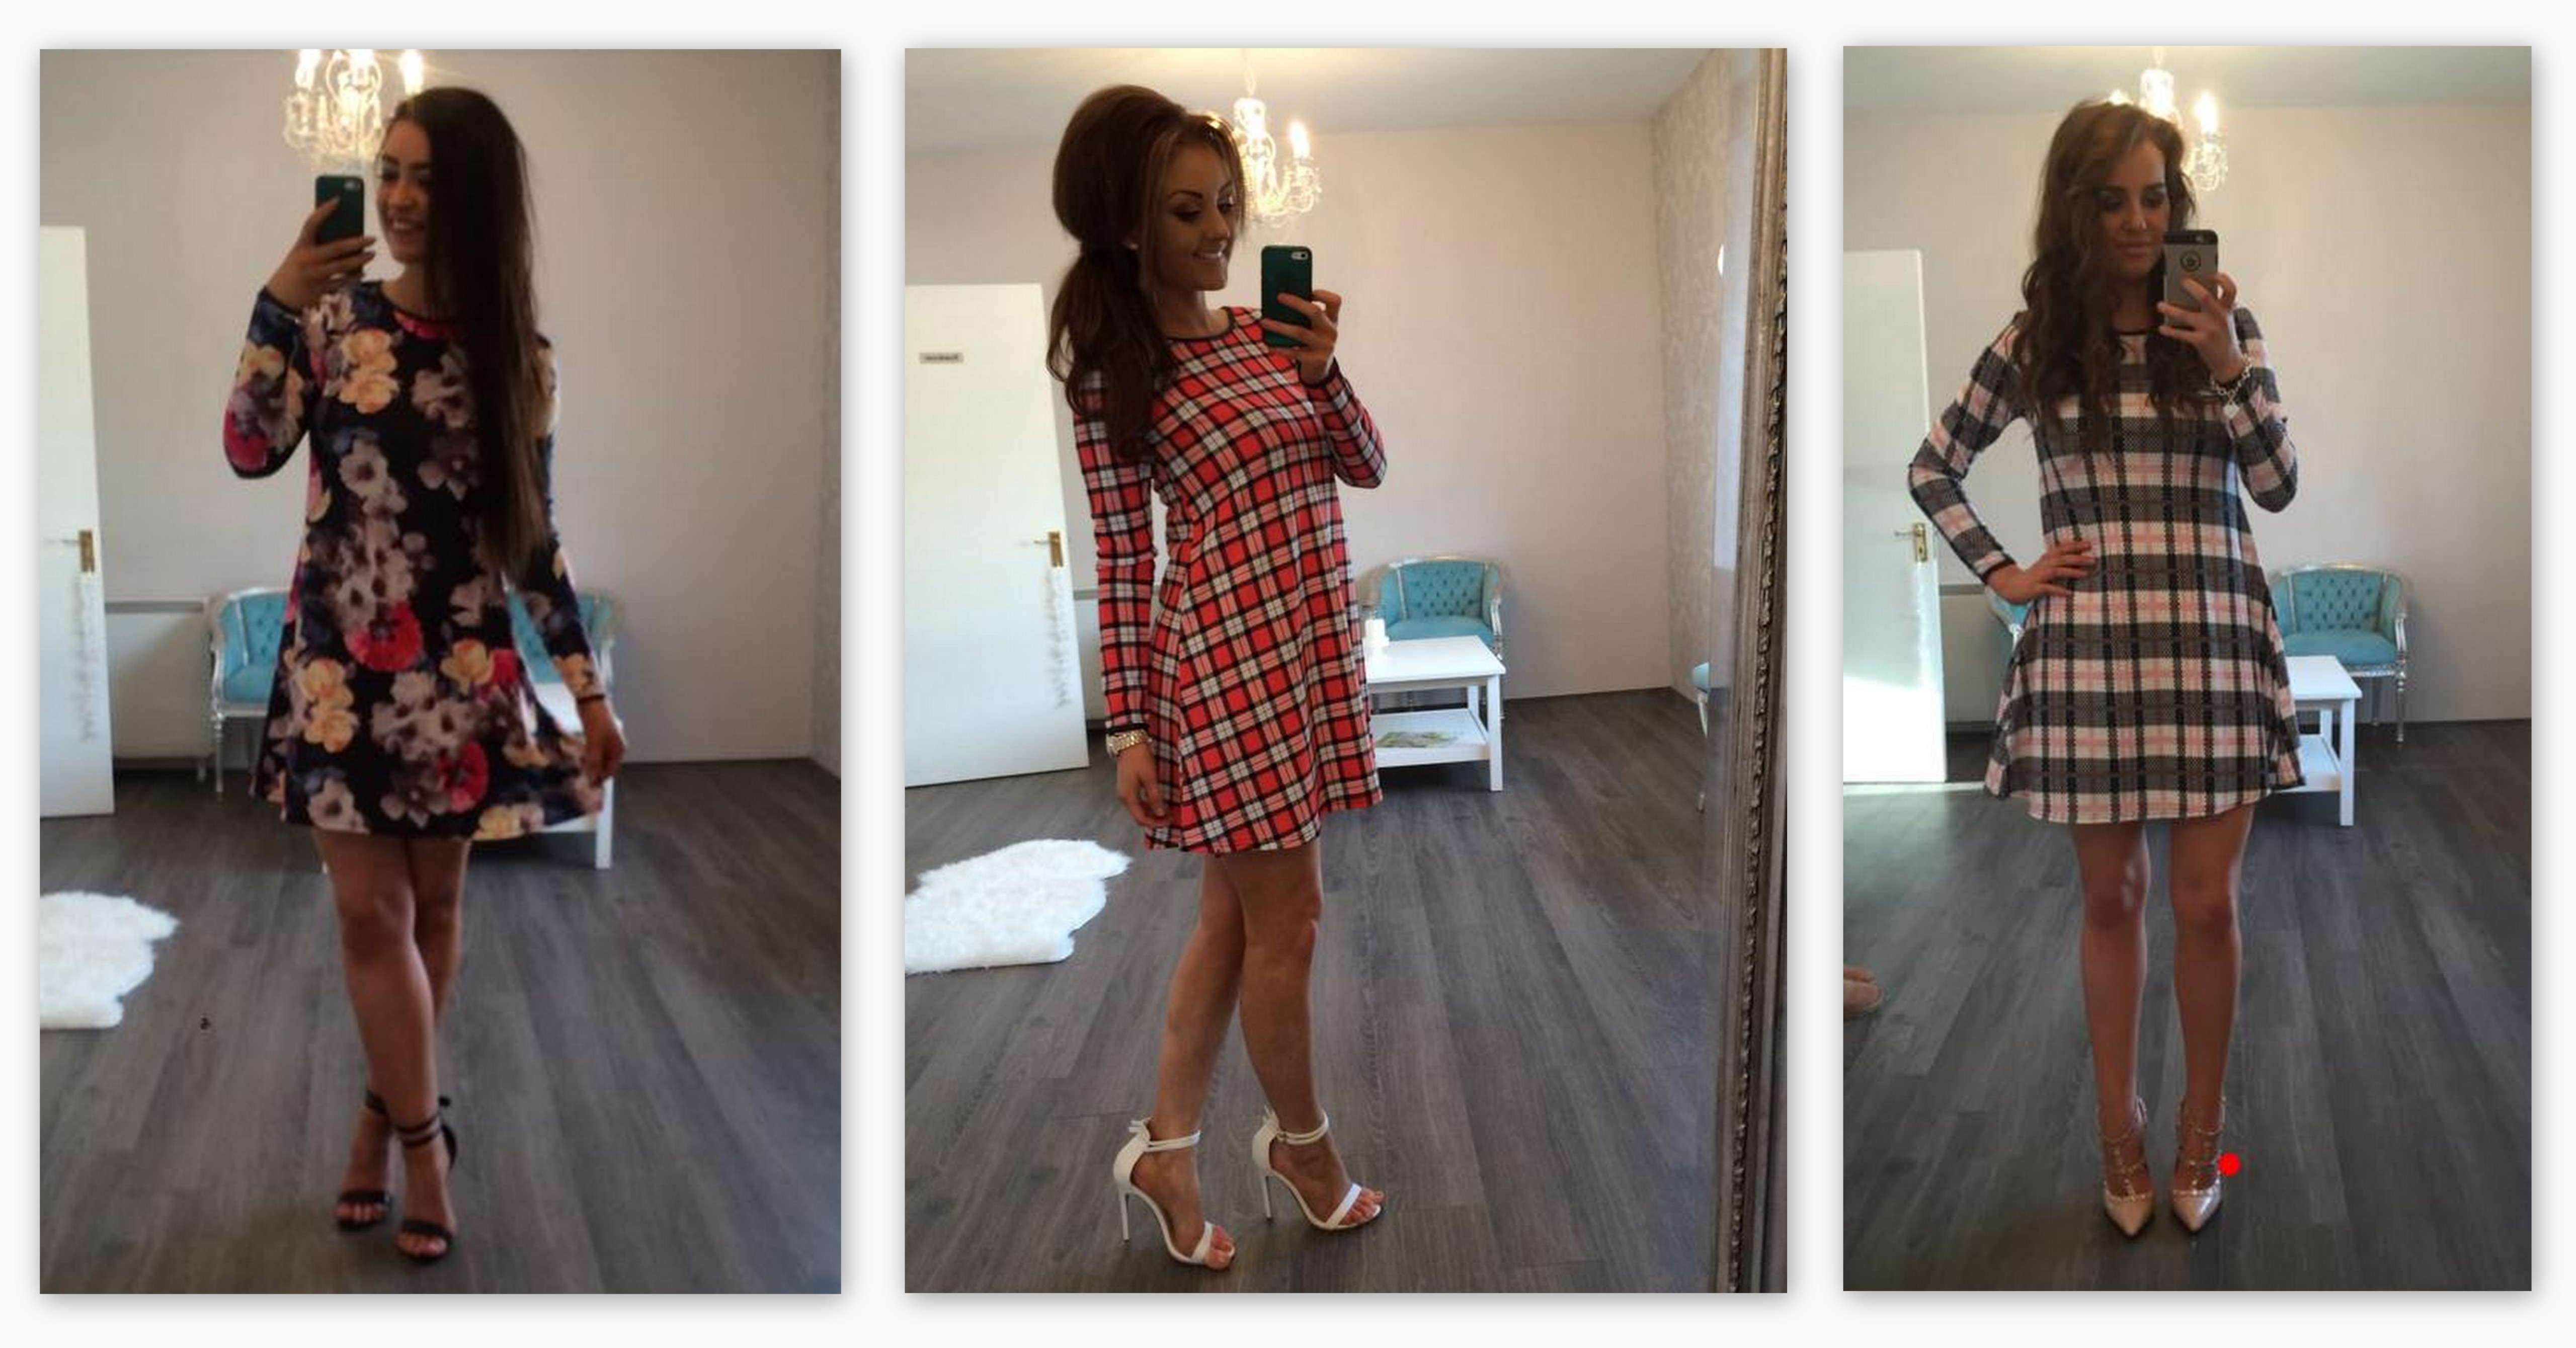 New 2015 Swing Dresses - Buy Online Ireland